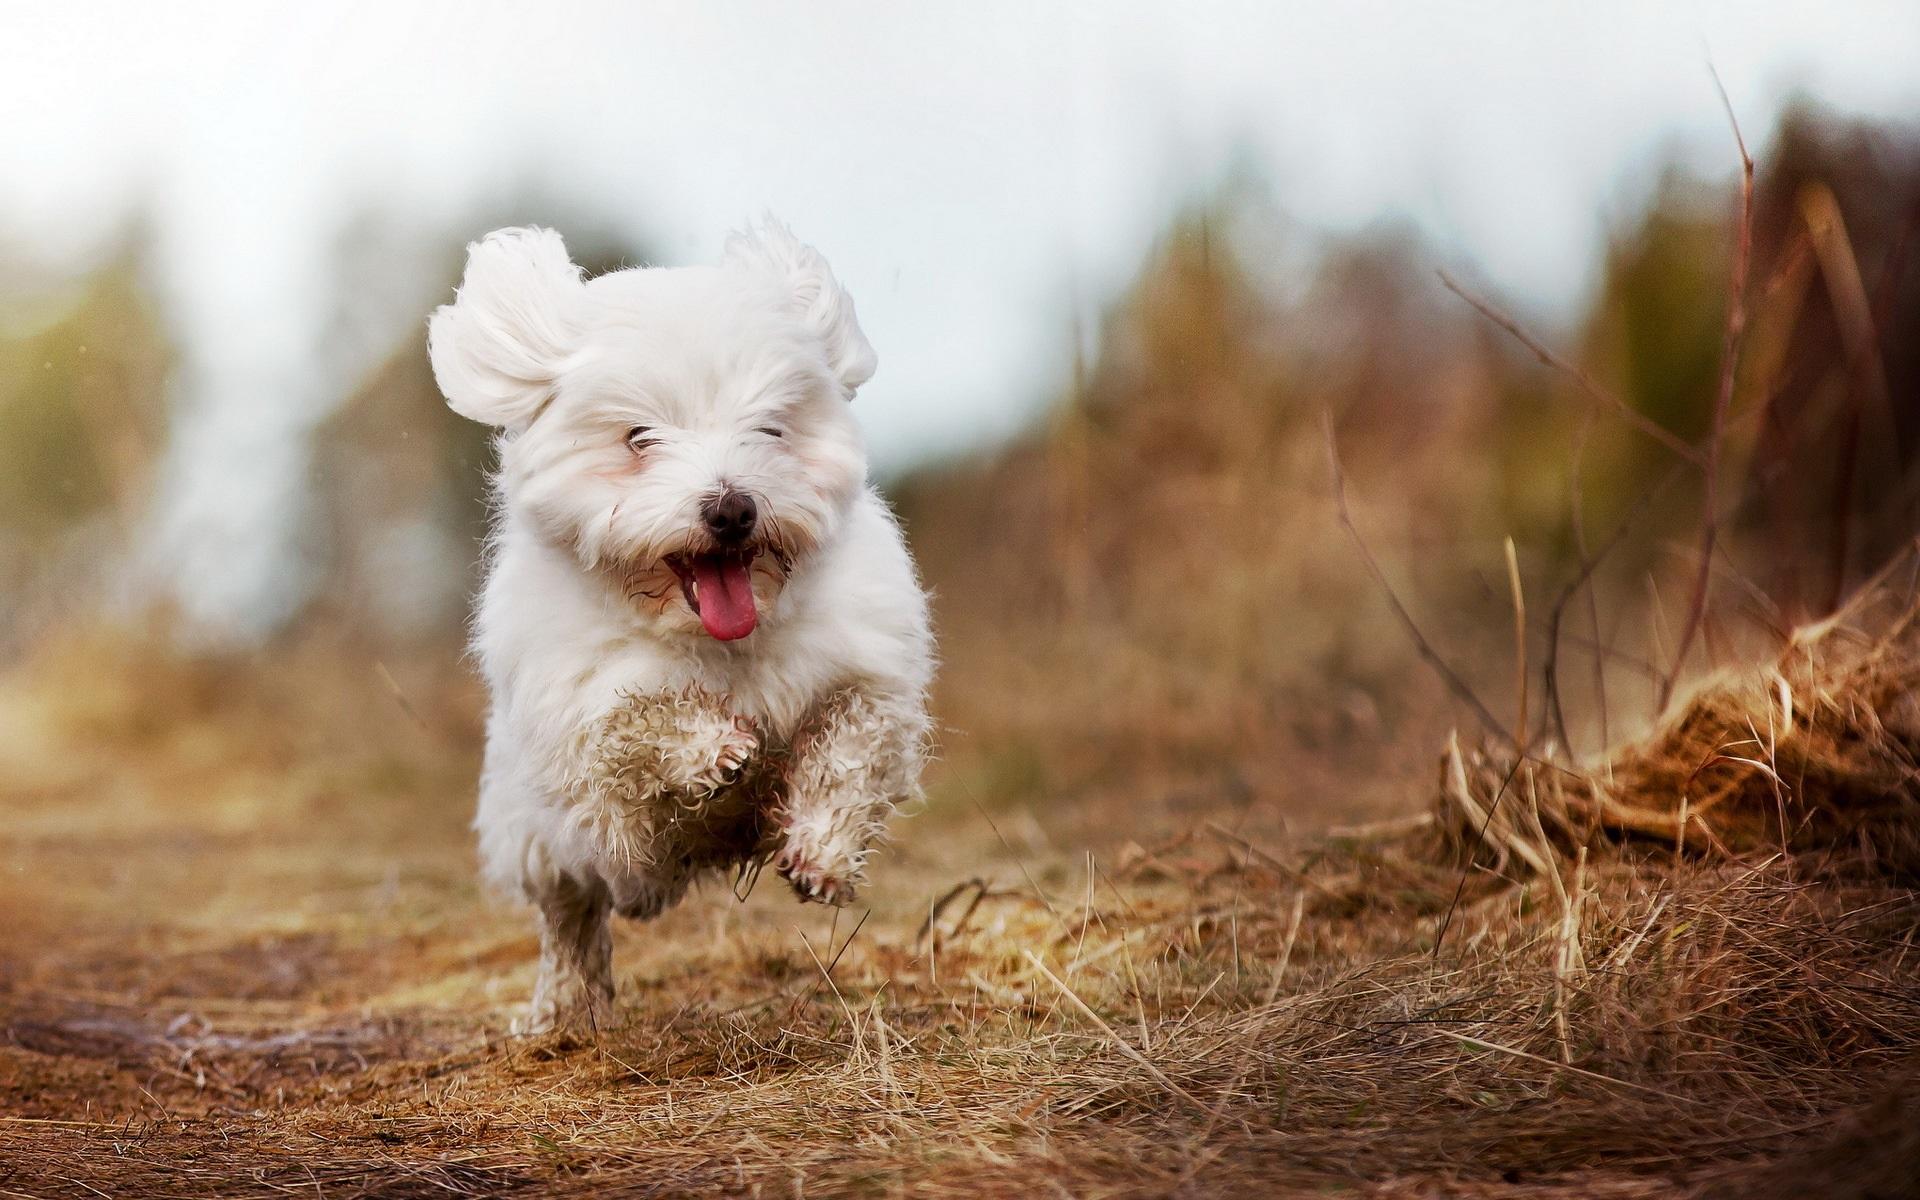 Мчащийся собачка без смс